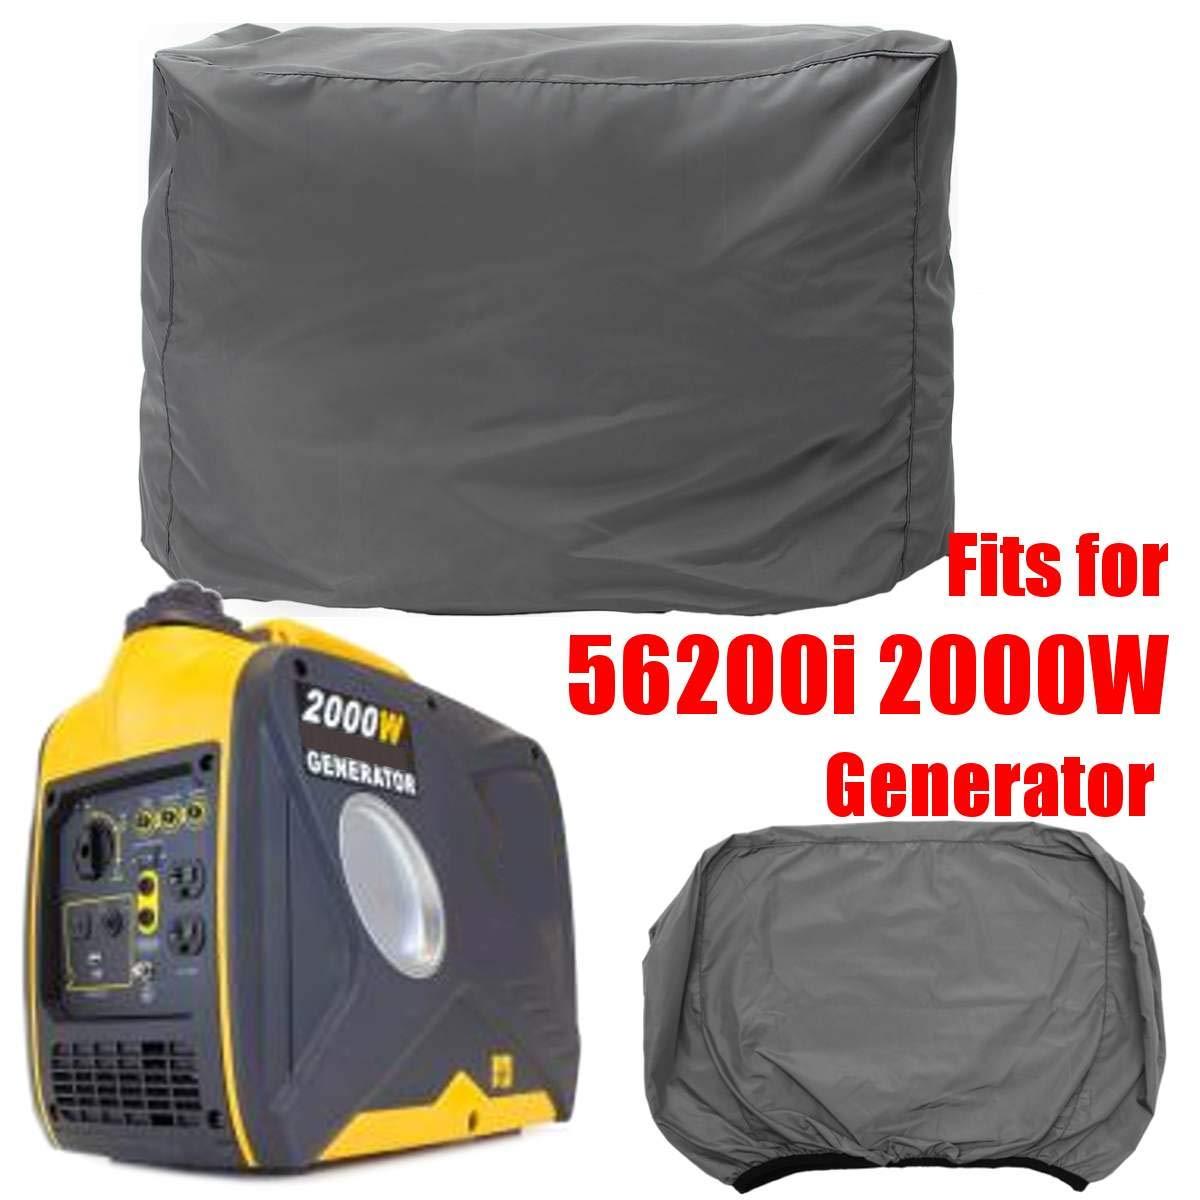 Funky Monkey Generator Cover-Waterproof Generator Cover 28Cmx53Cmx46Cm Grey Universal Weatherproof Inverter Generator Cover by Funky Monkey